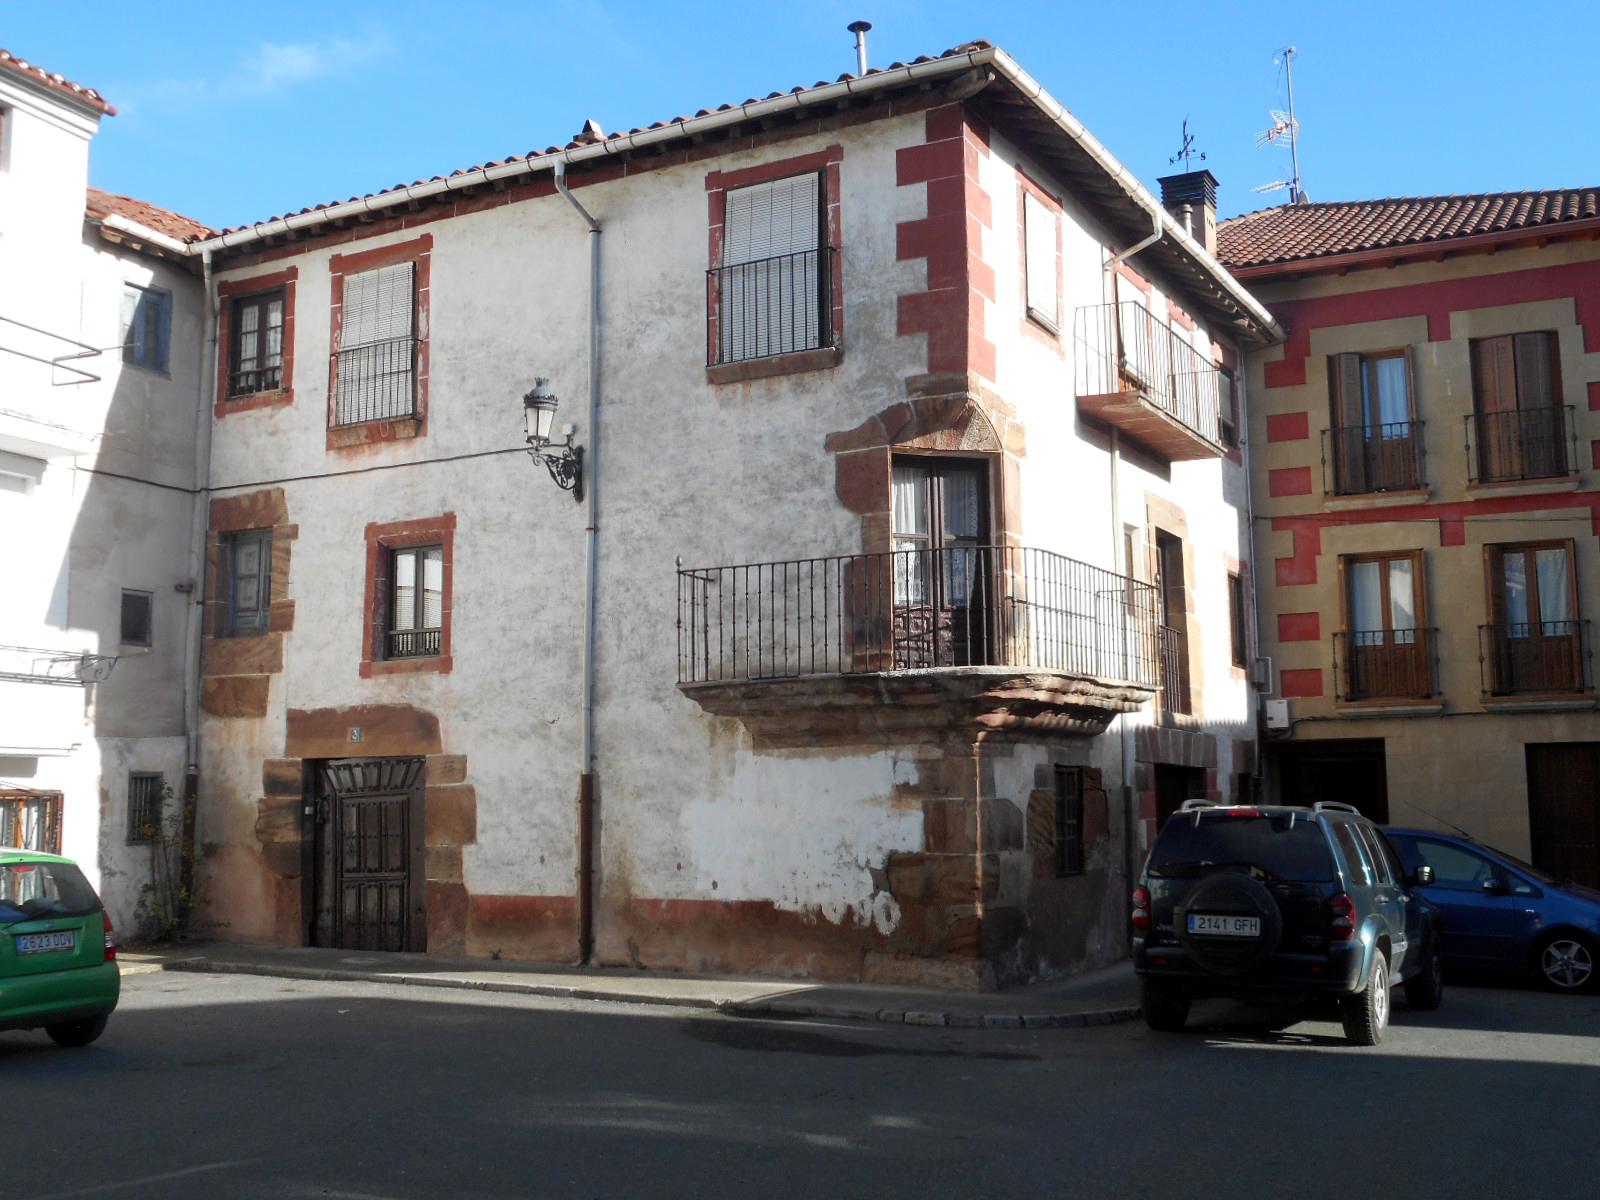 Casas solariegas en la rioja 374 ezcaray otras - Casas prefabricadas la rioja ...